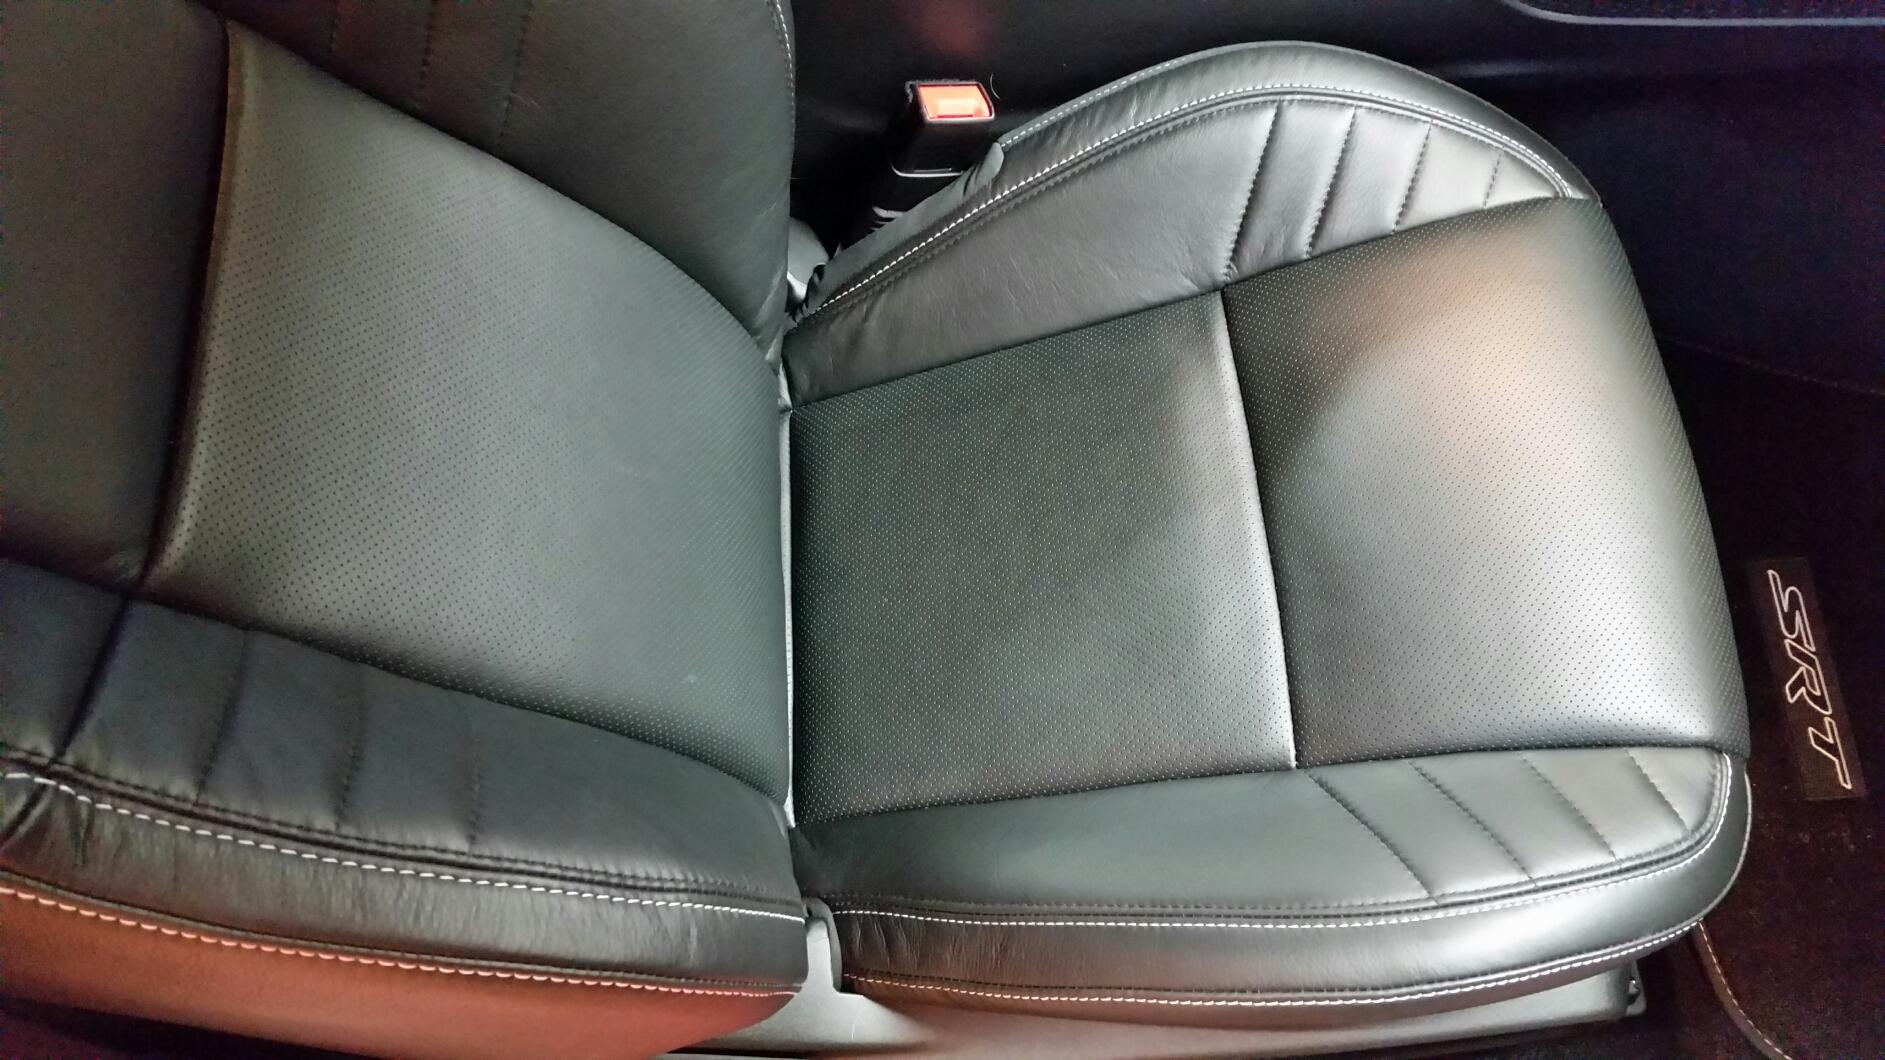 vehicle challenger srt hellcat 2014 11 27 033555jpg - 2015 Dodge Challenger Srt Hellcat Sepia Laguna Leather